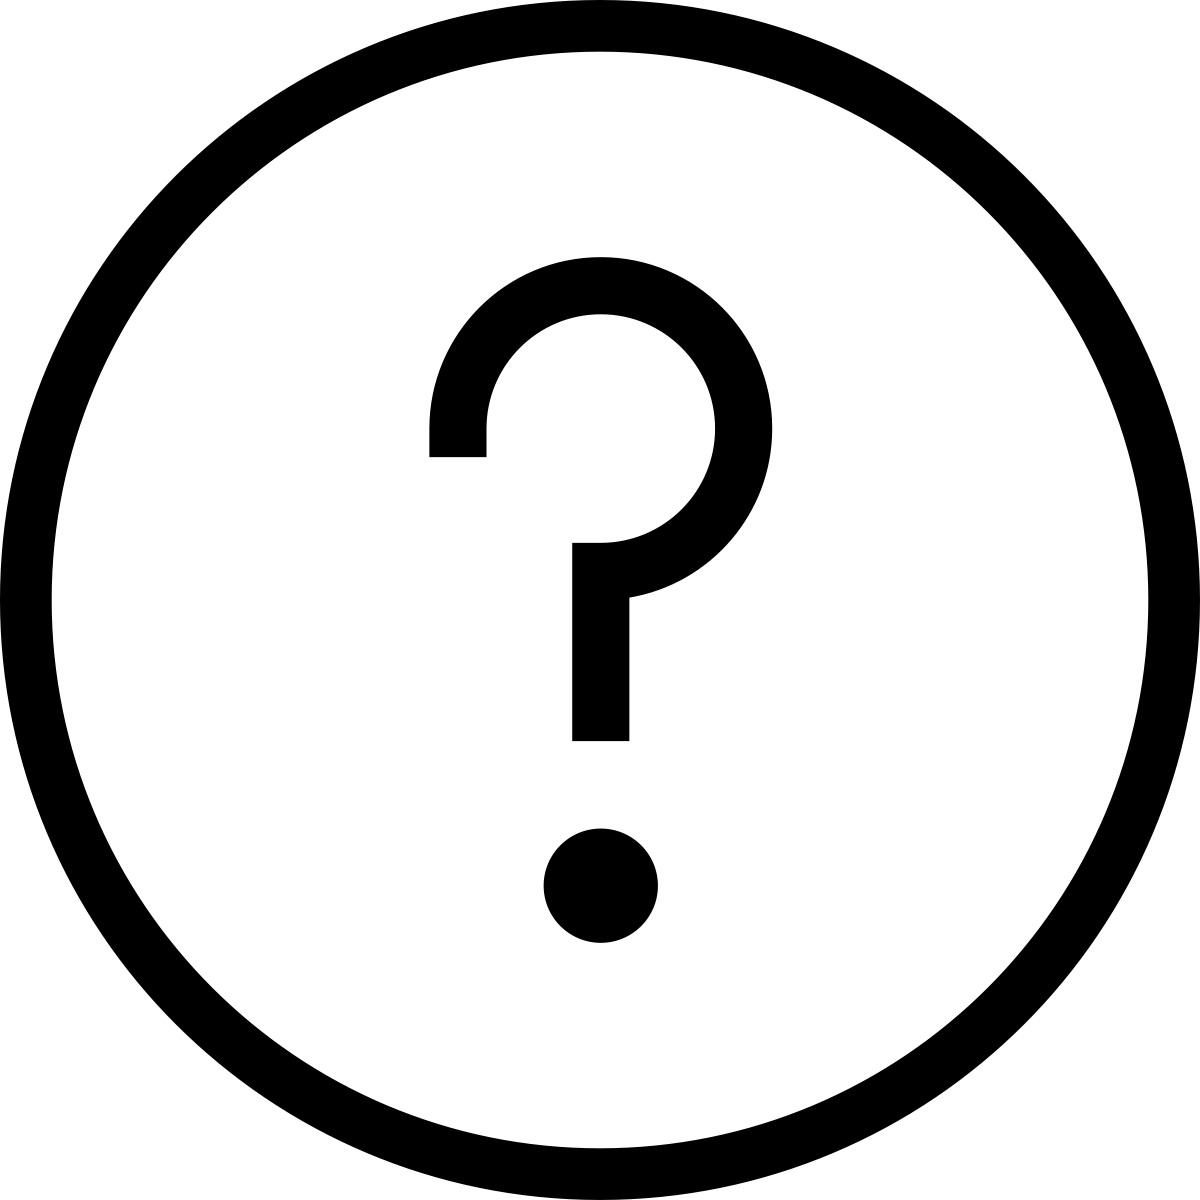 noun_FAQ_1272960_000000.jpg